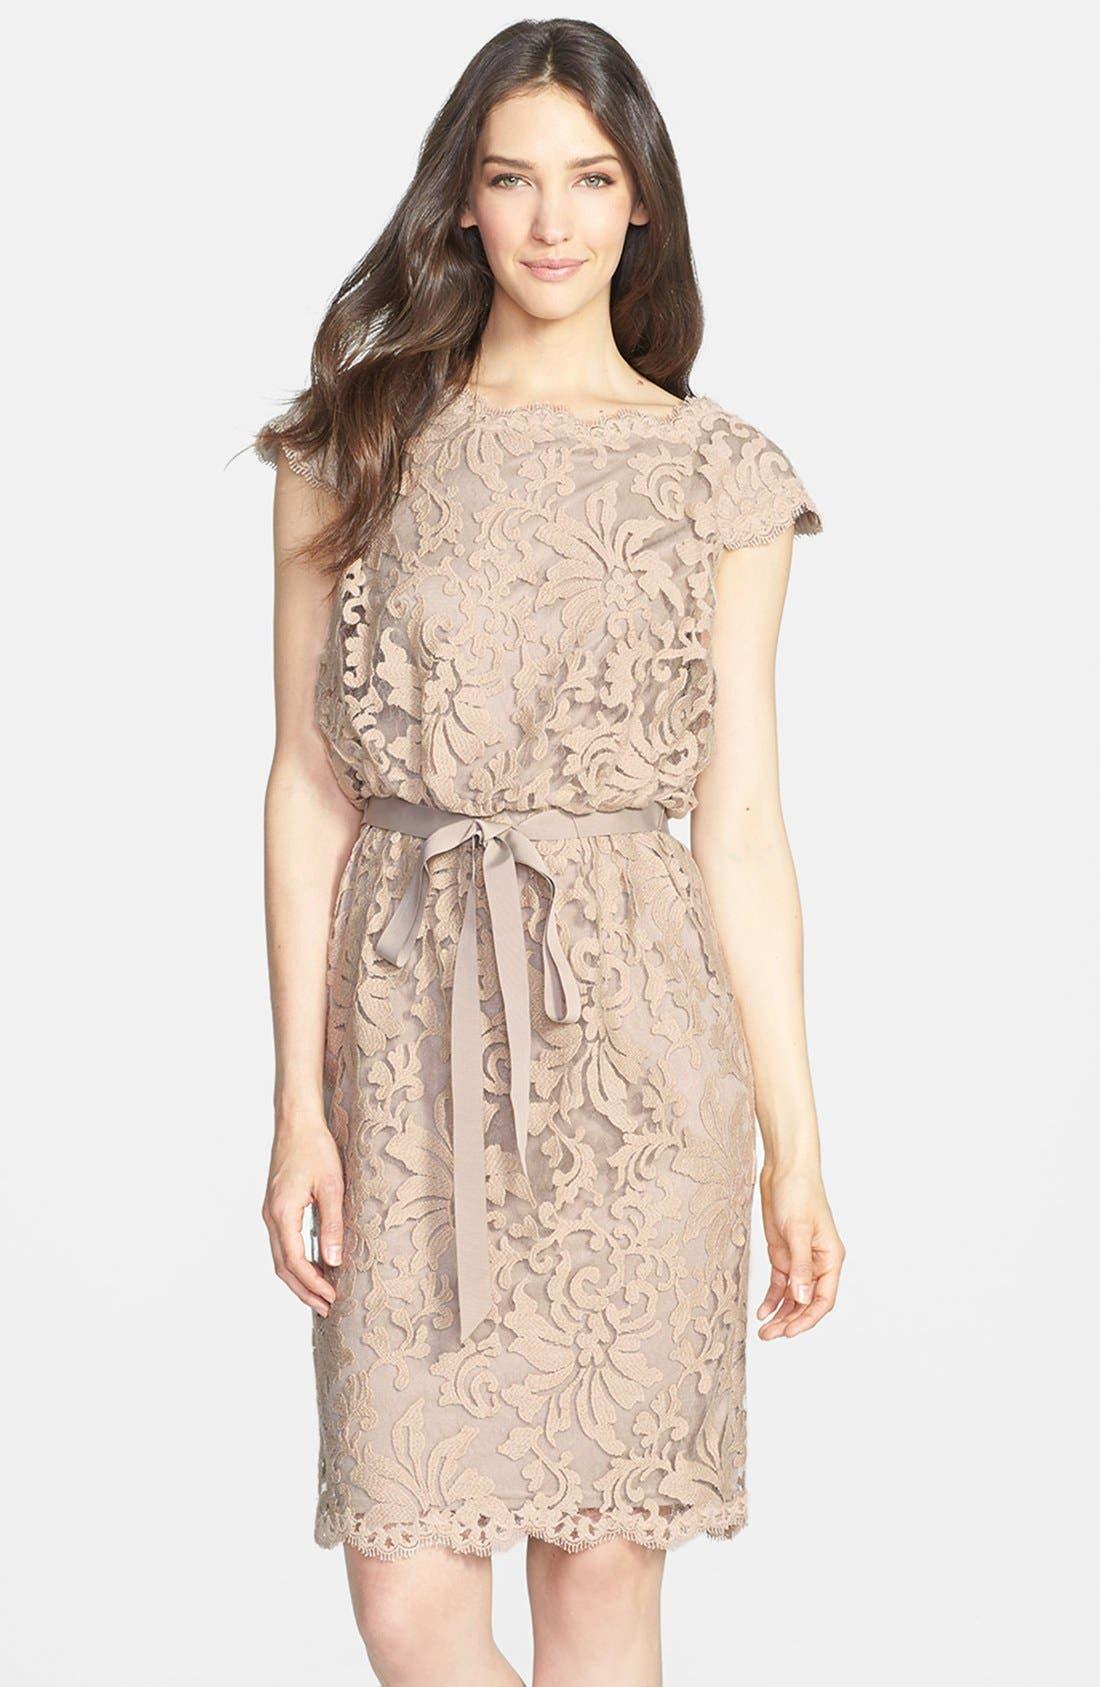 Alternate Image 1 Selected - Tadashi Shoji Lace Blouson Dress